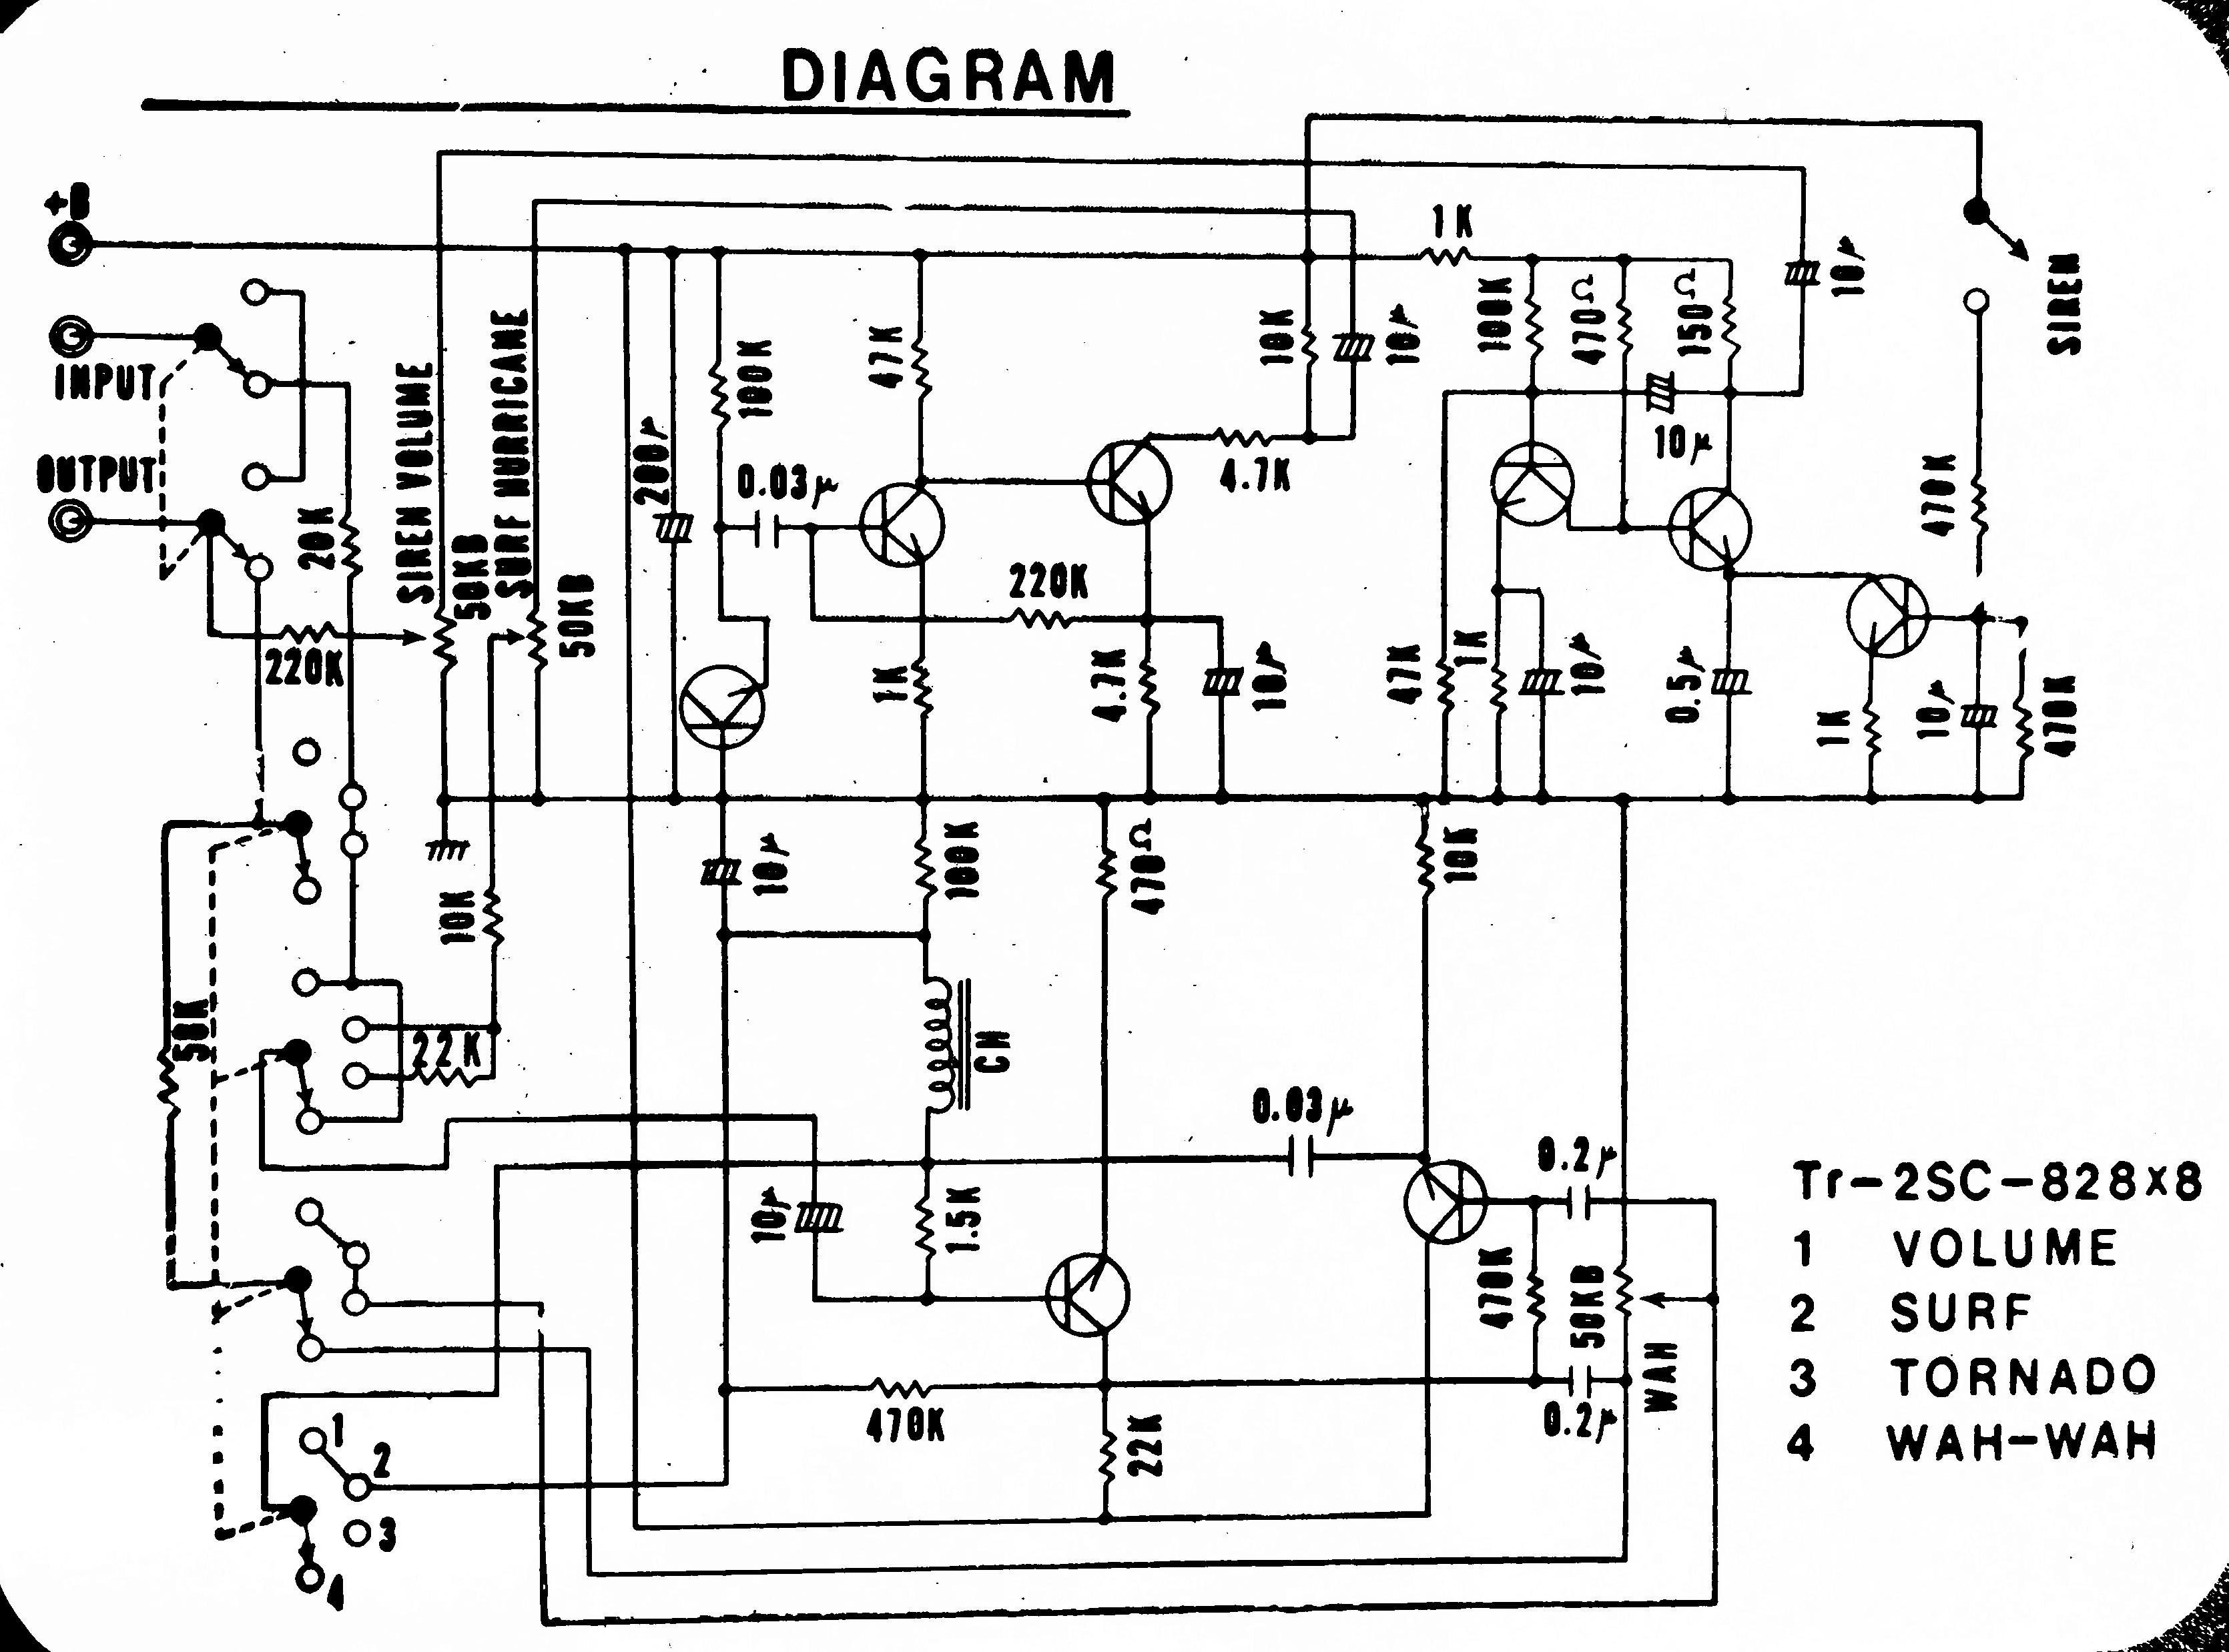 lag circuit